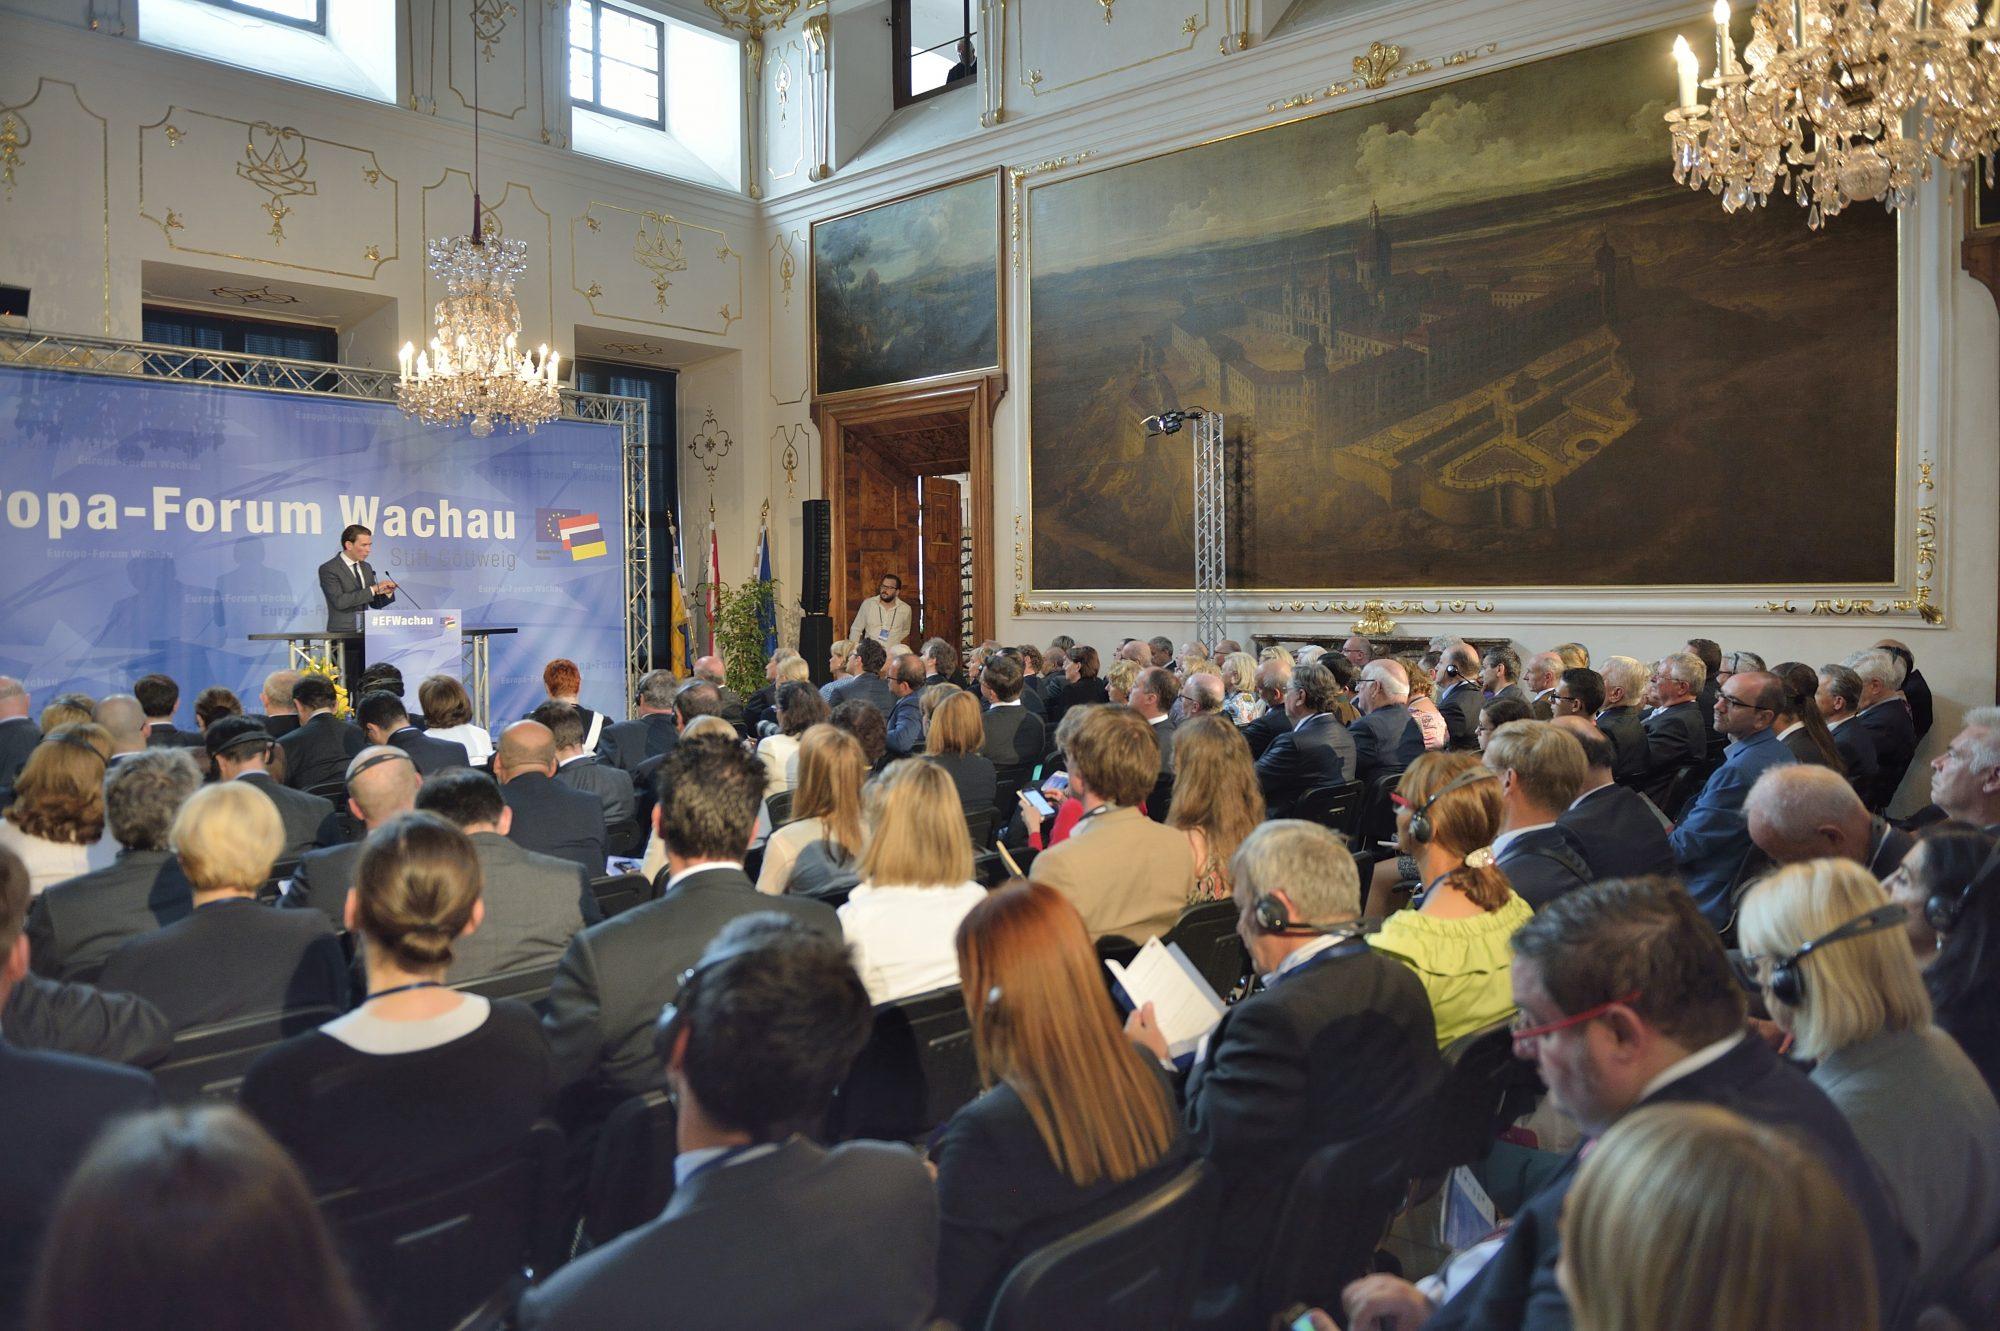 Europa-Forum Wachau 2016